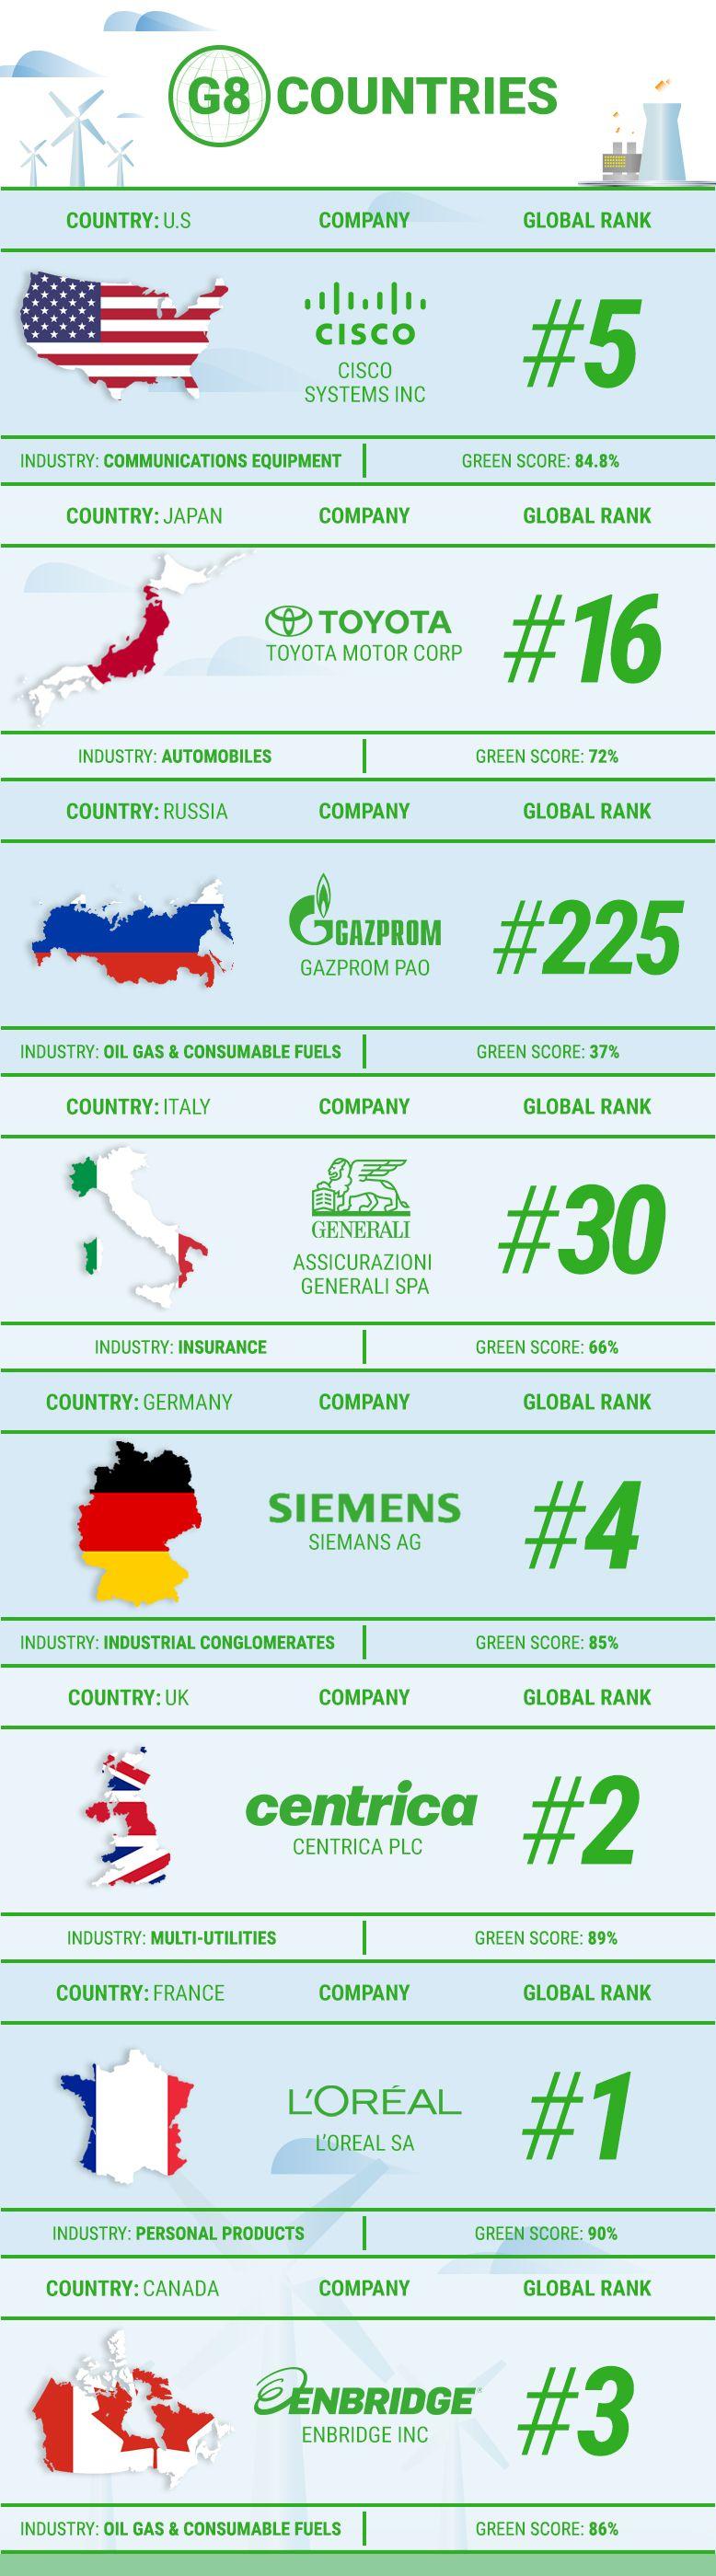 infographic_g8.jpg